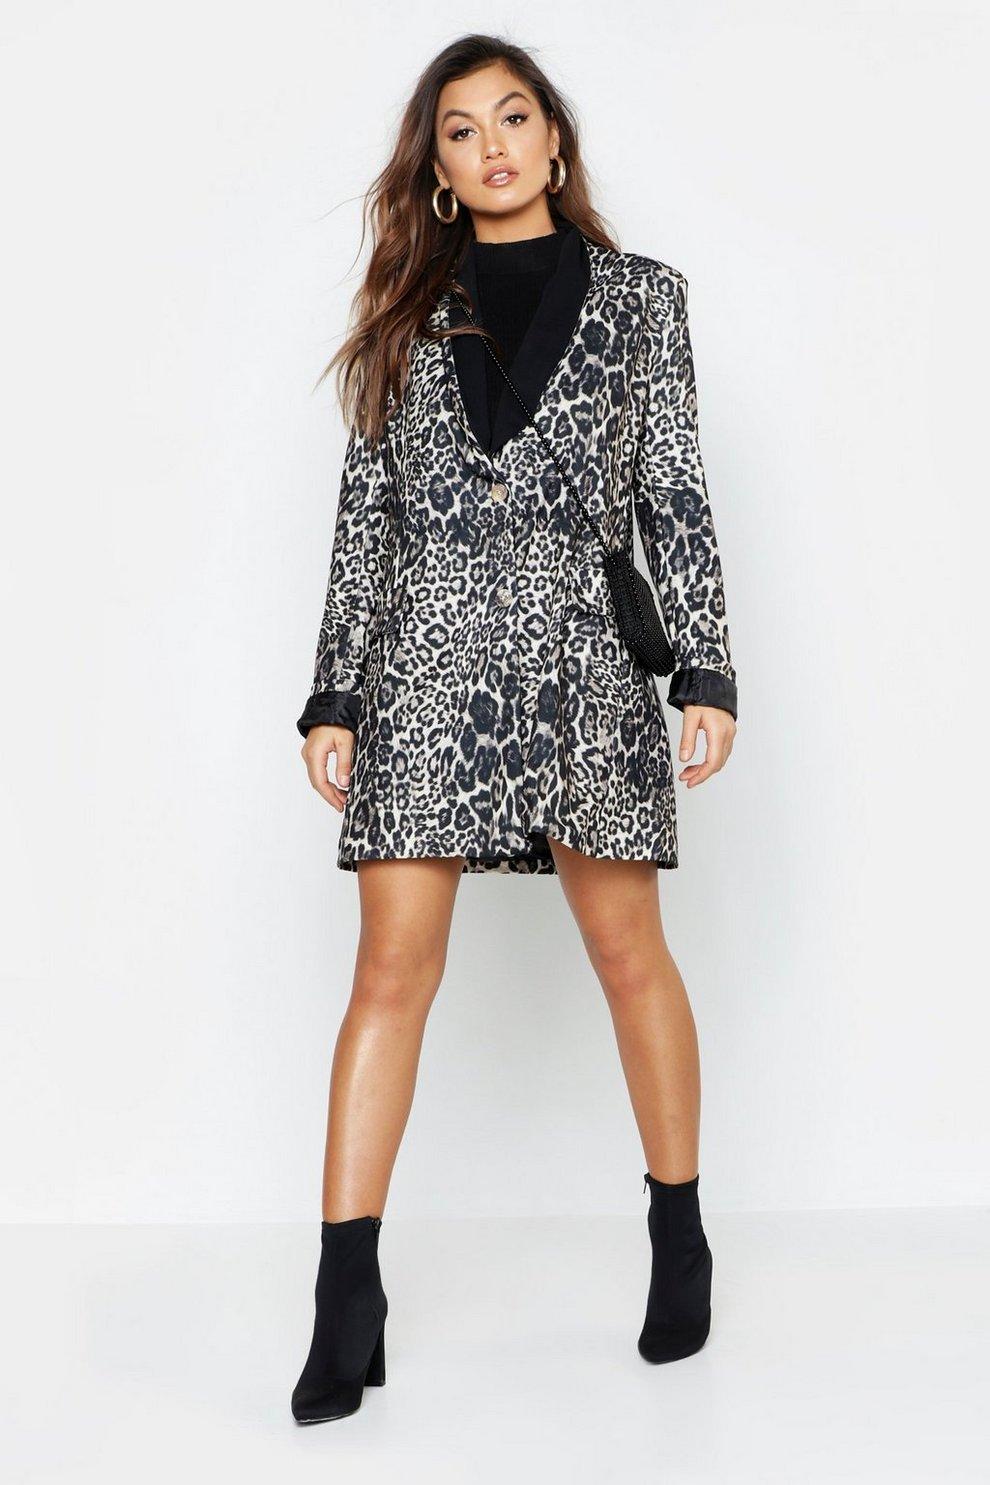 887beb26fe82 Leopard Print Contrast Print Blazer Dress | Boohoo